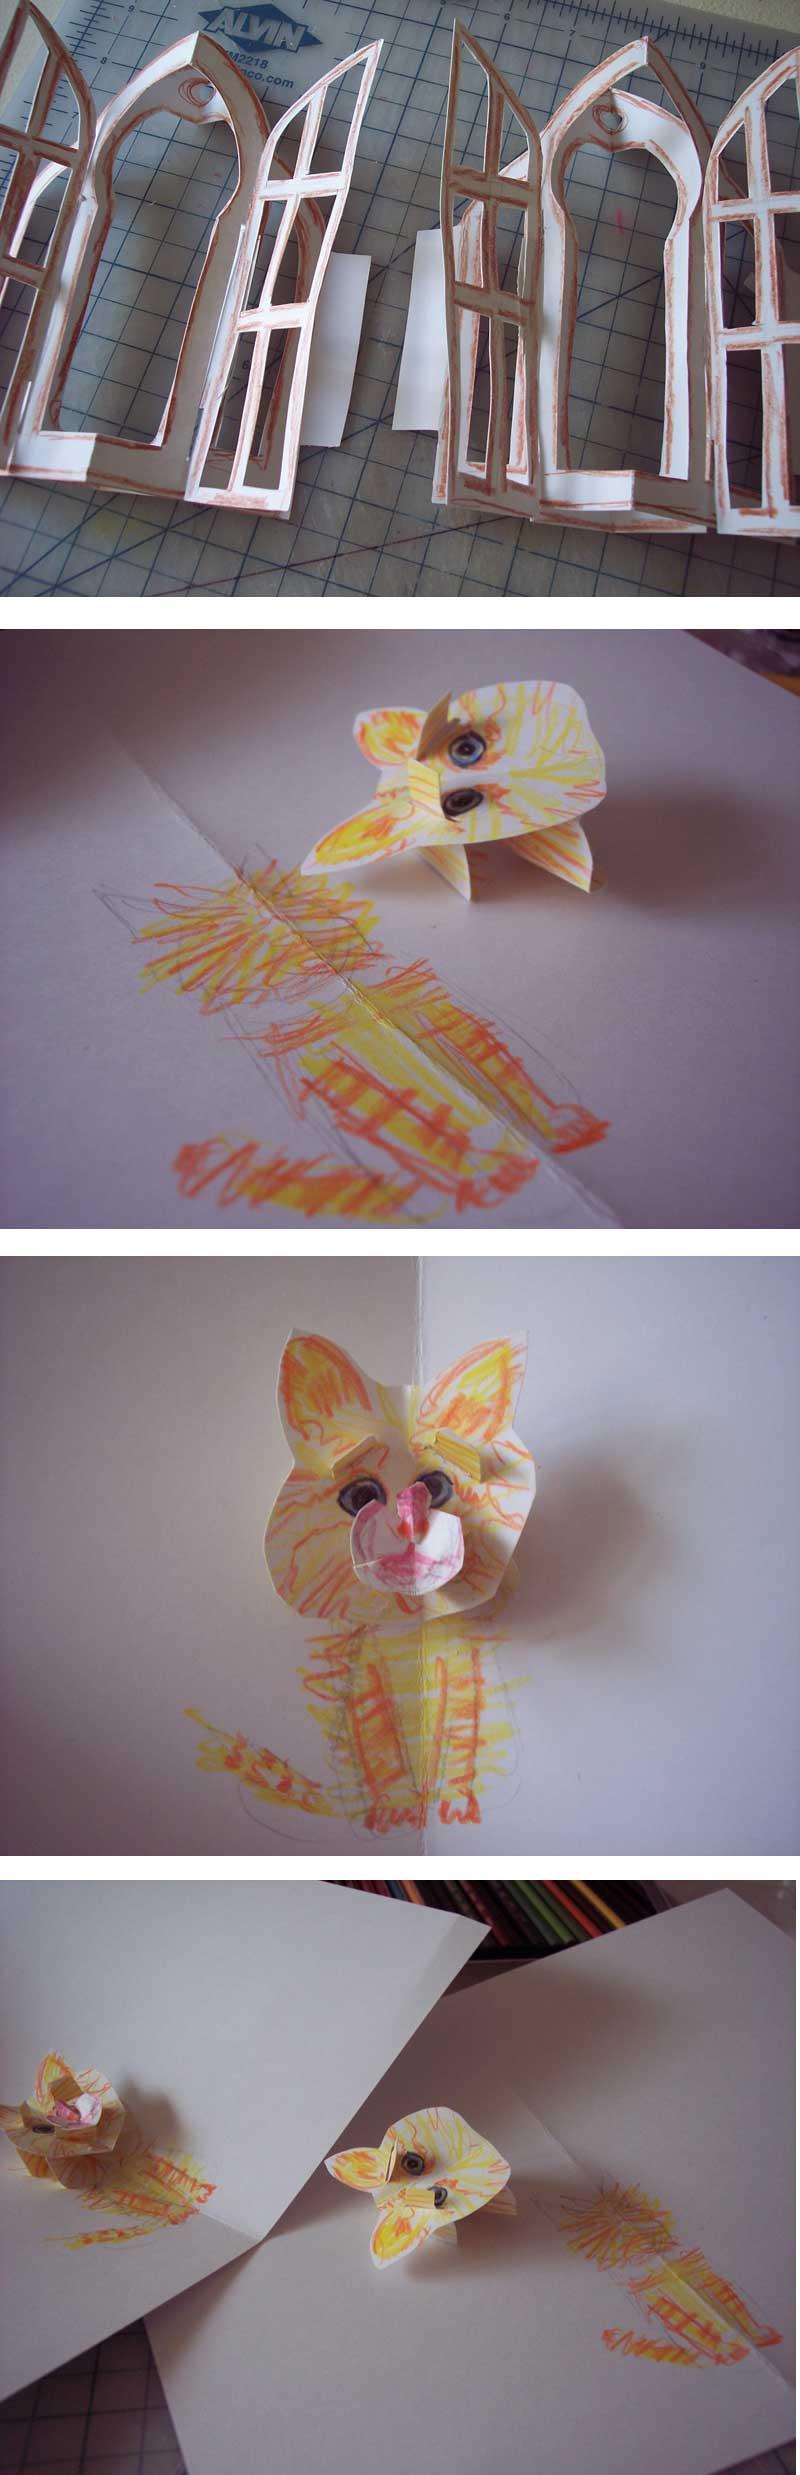 kitty pop-up card 5,6,7,8